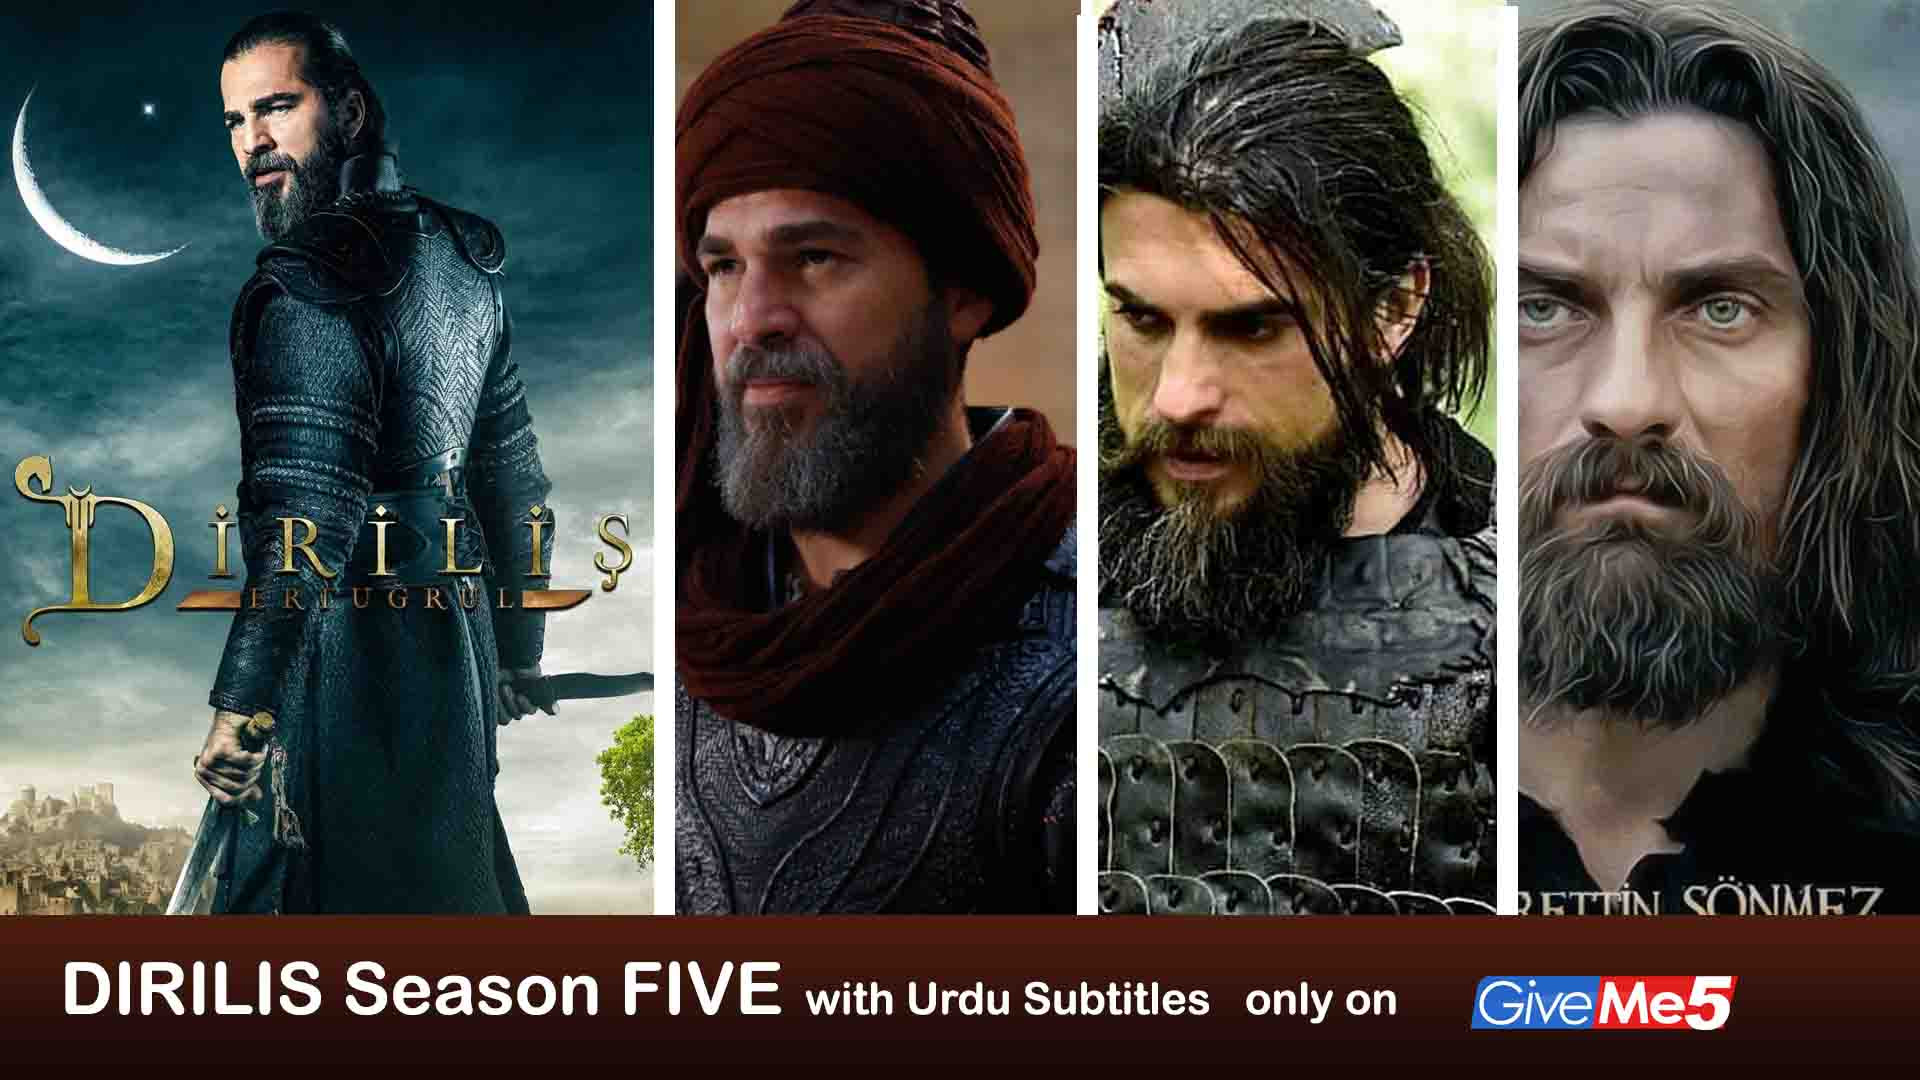 Season 5 with Urdu Subtitles